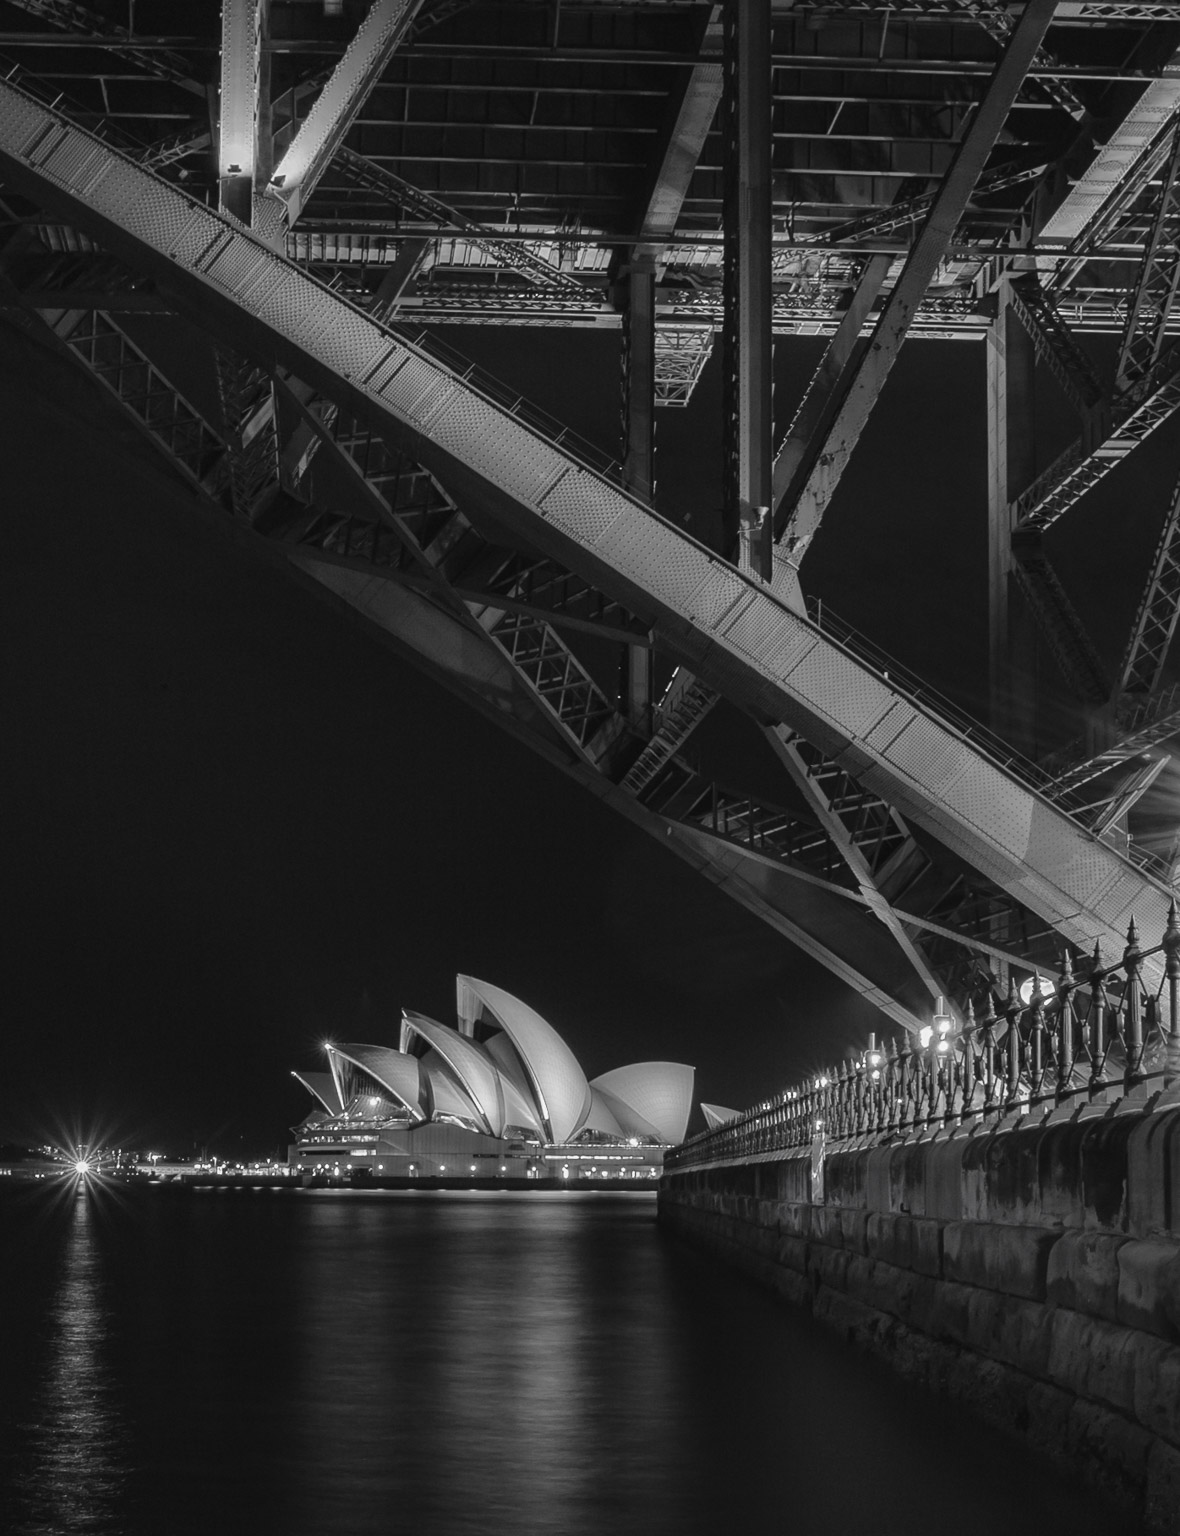 Opera House bw night (1 of 1).jpg